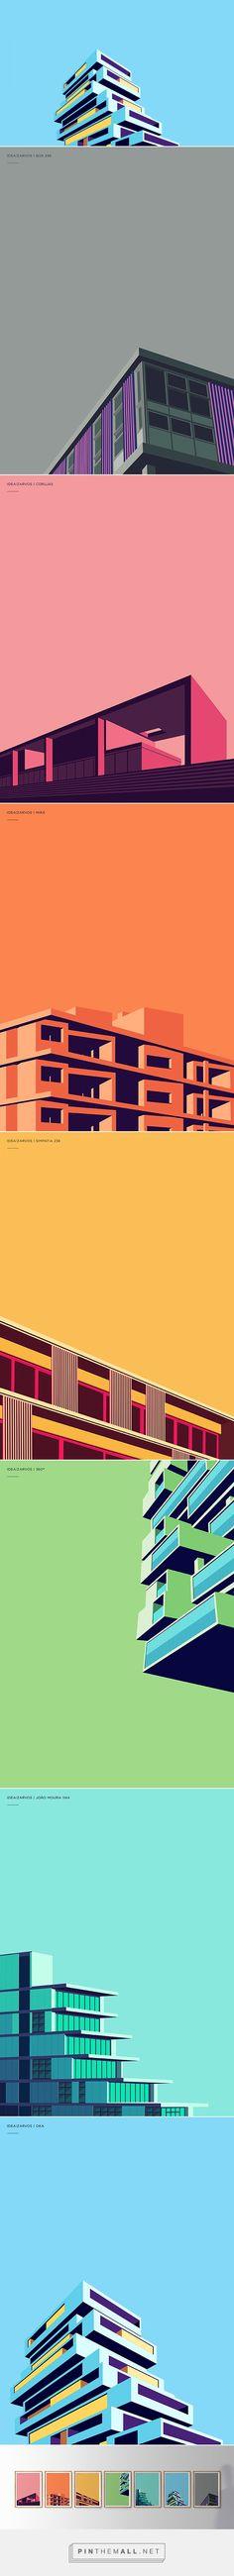 Zarvos - Architecture Posters